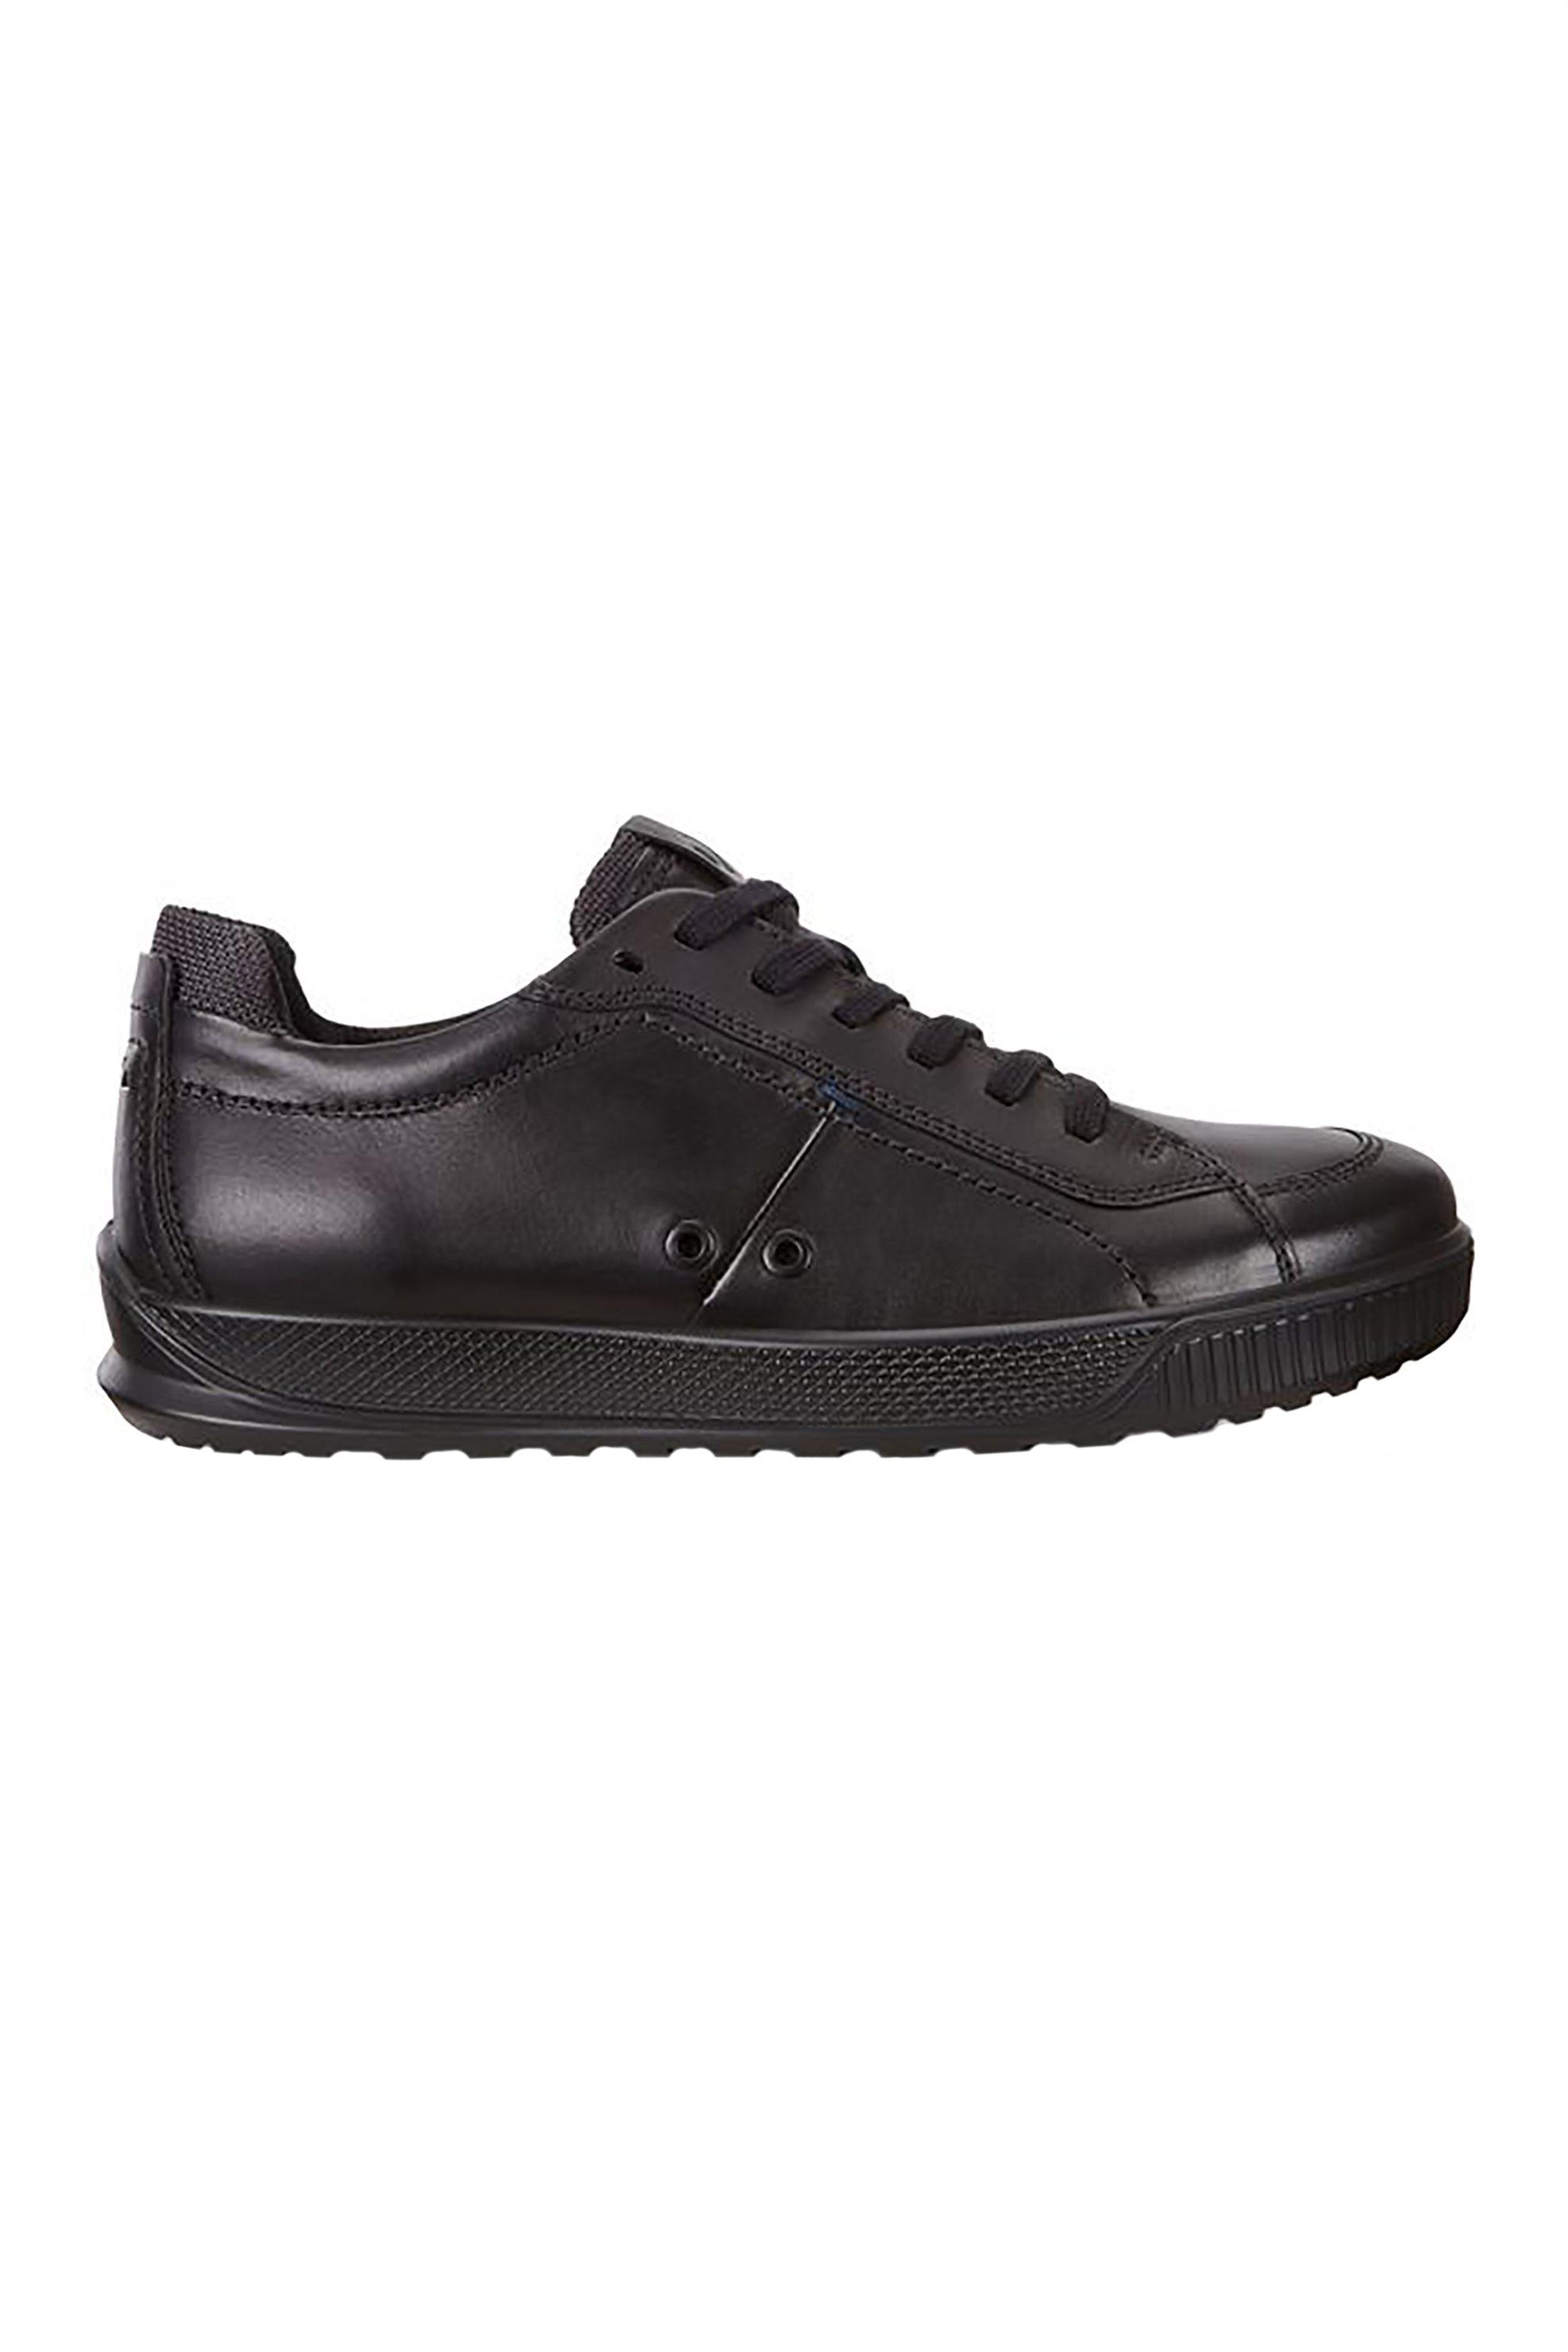 ECCO ανδρικά sneakers με κορδόνια μονόχρωμα - 989-501544 01001 - Μαύρο